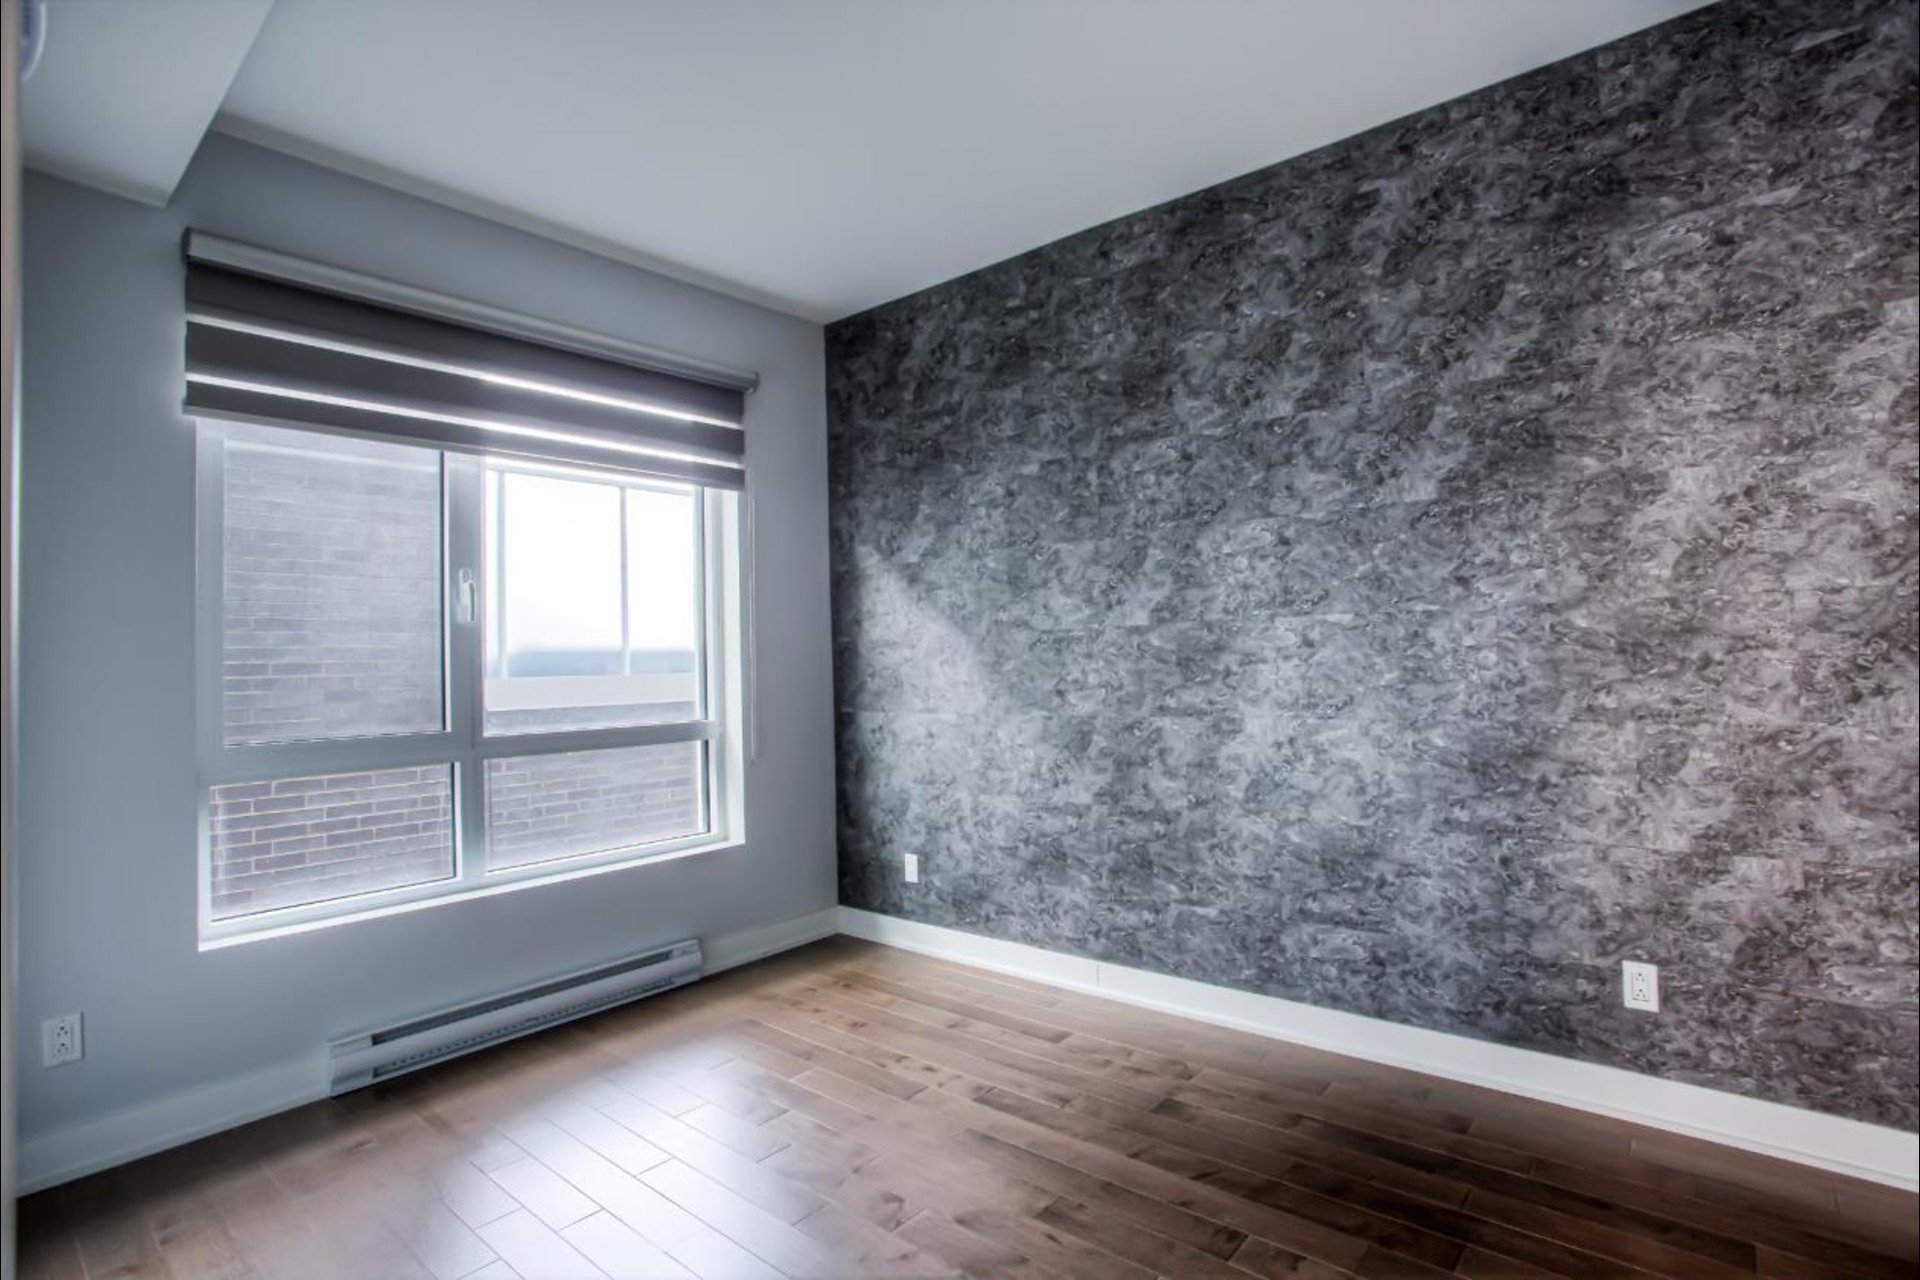 image 11 - 公寓 出租 Montréal - 6 室